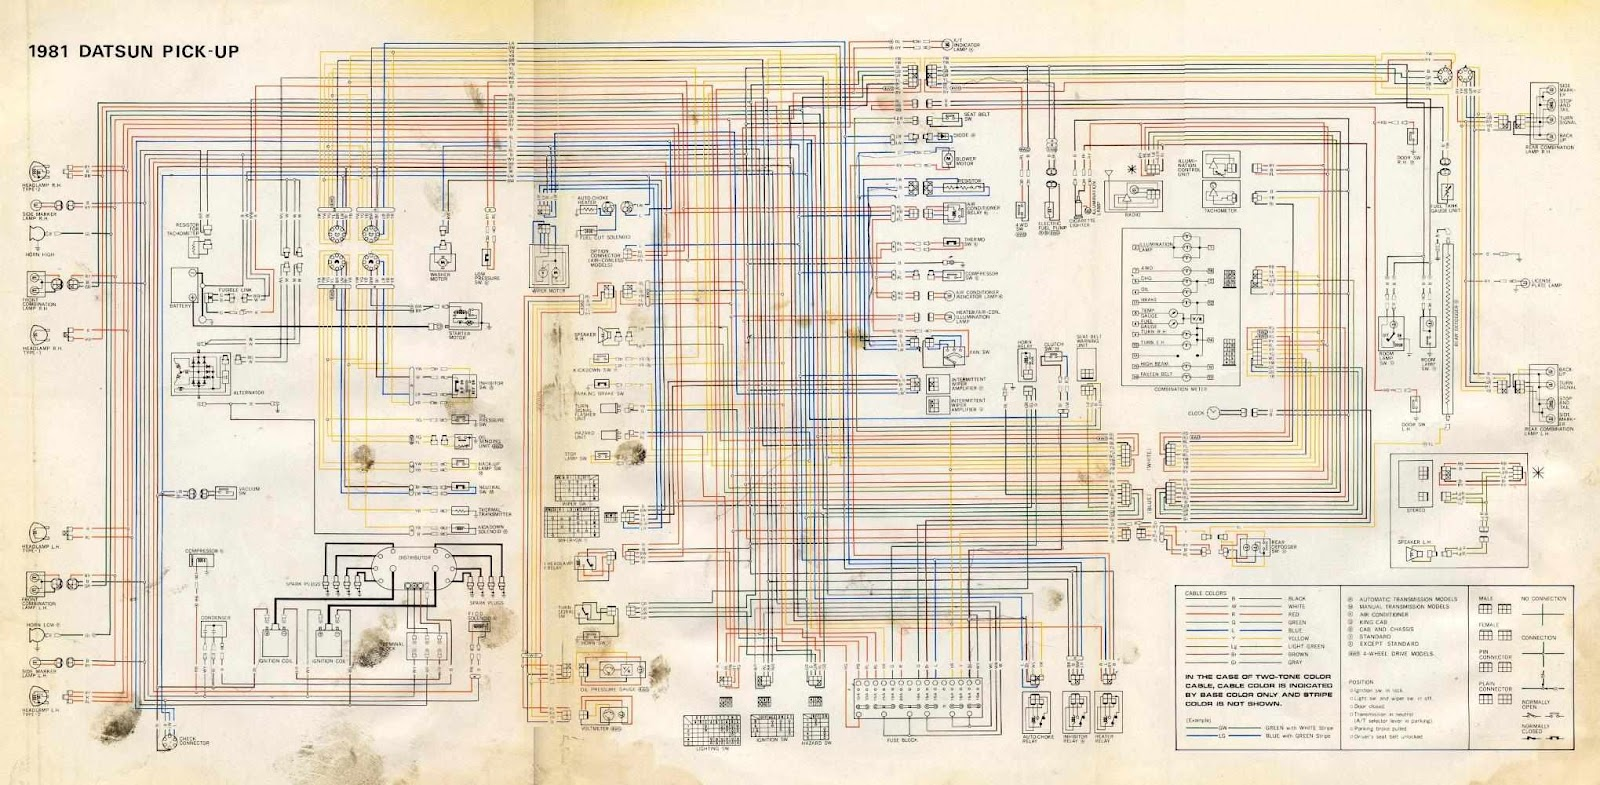 1971 Datsun 510 Wiring Diagram Microsoft Exchange Topology 21 Images